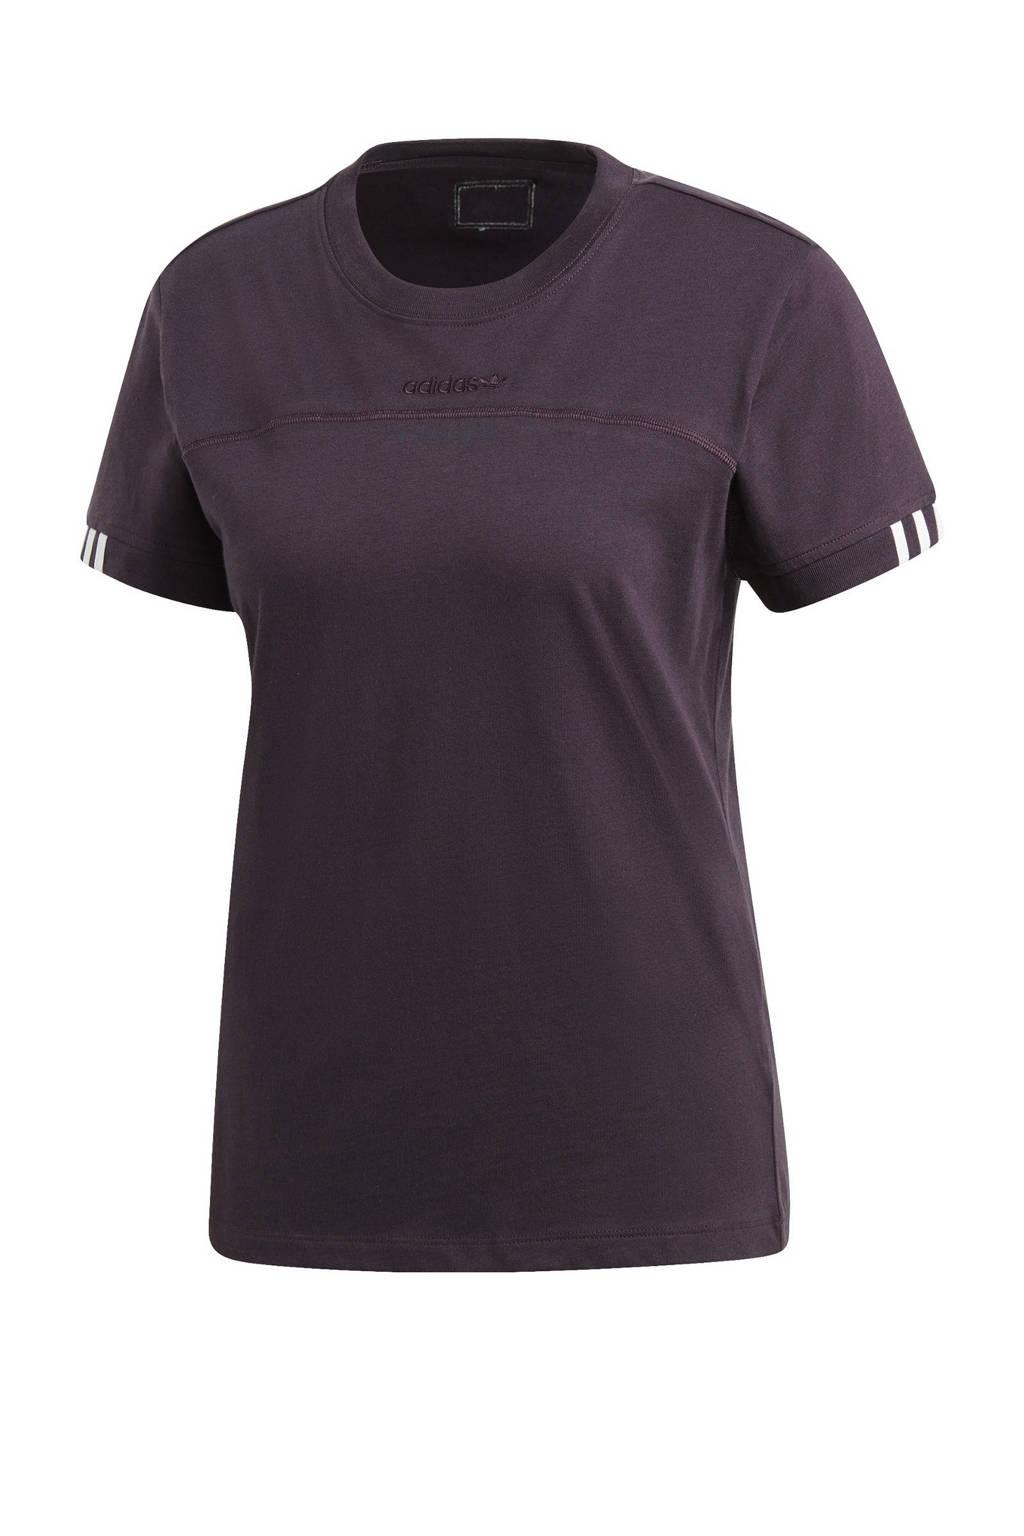 adidas Originals T-shirt donkerpaars, Donkerpaars